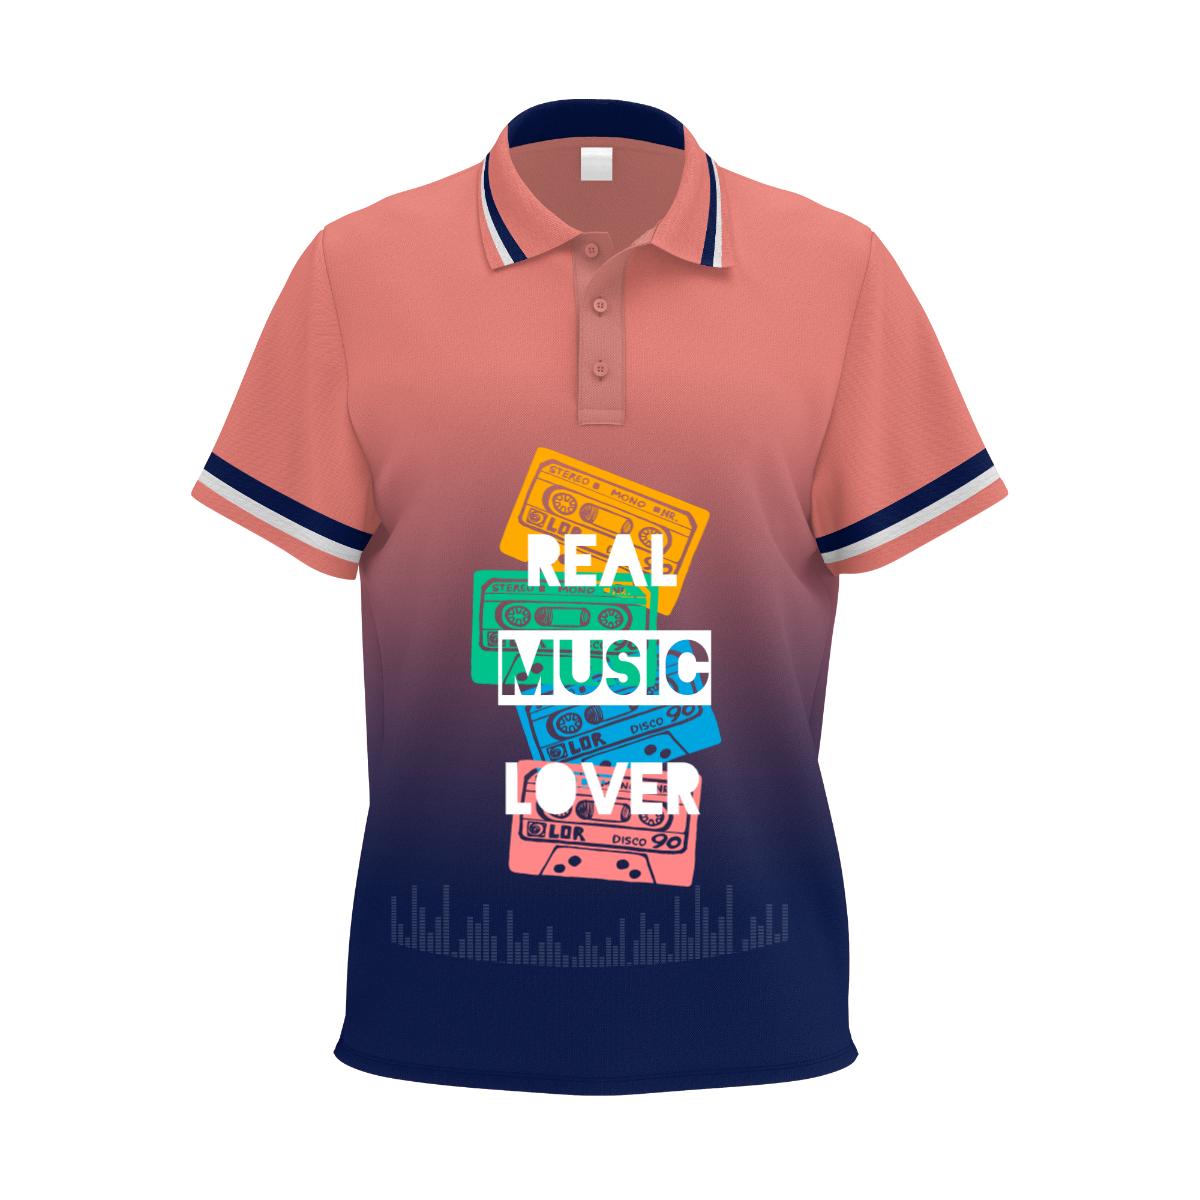 Real Music Lover Tshirt